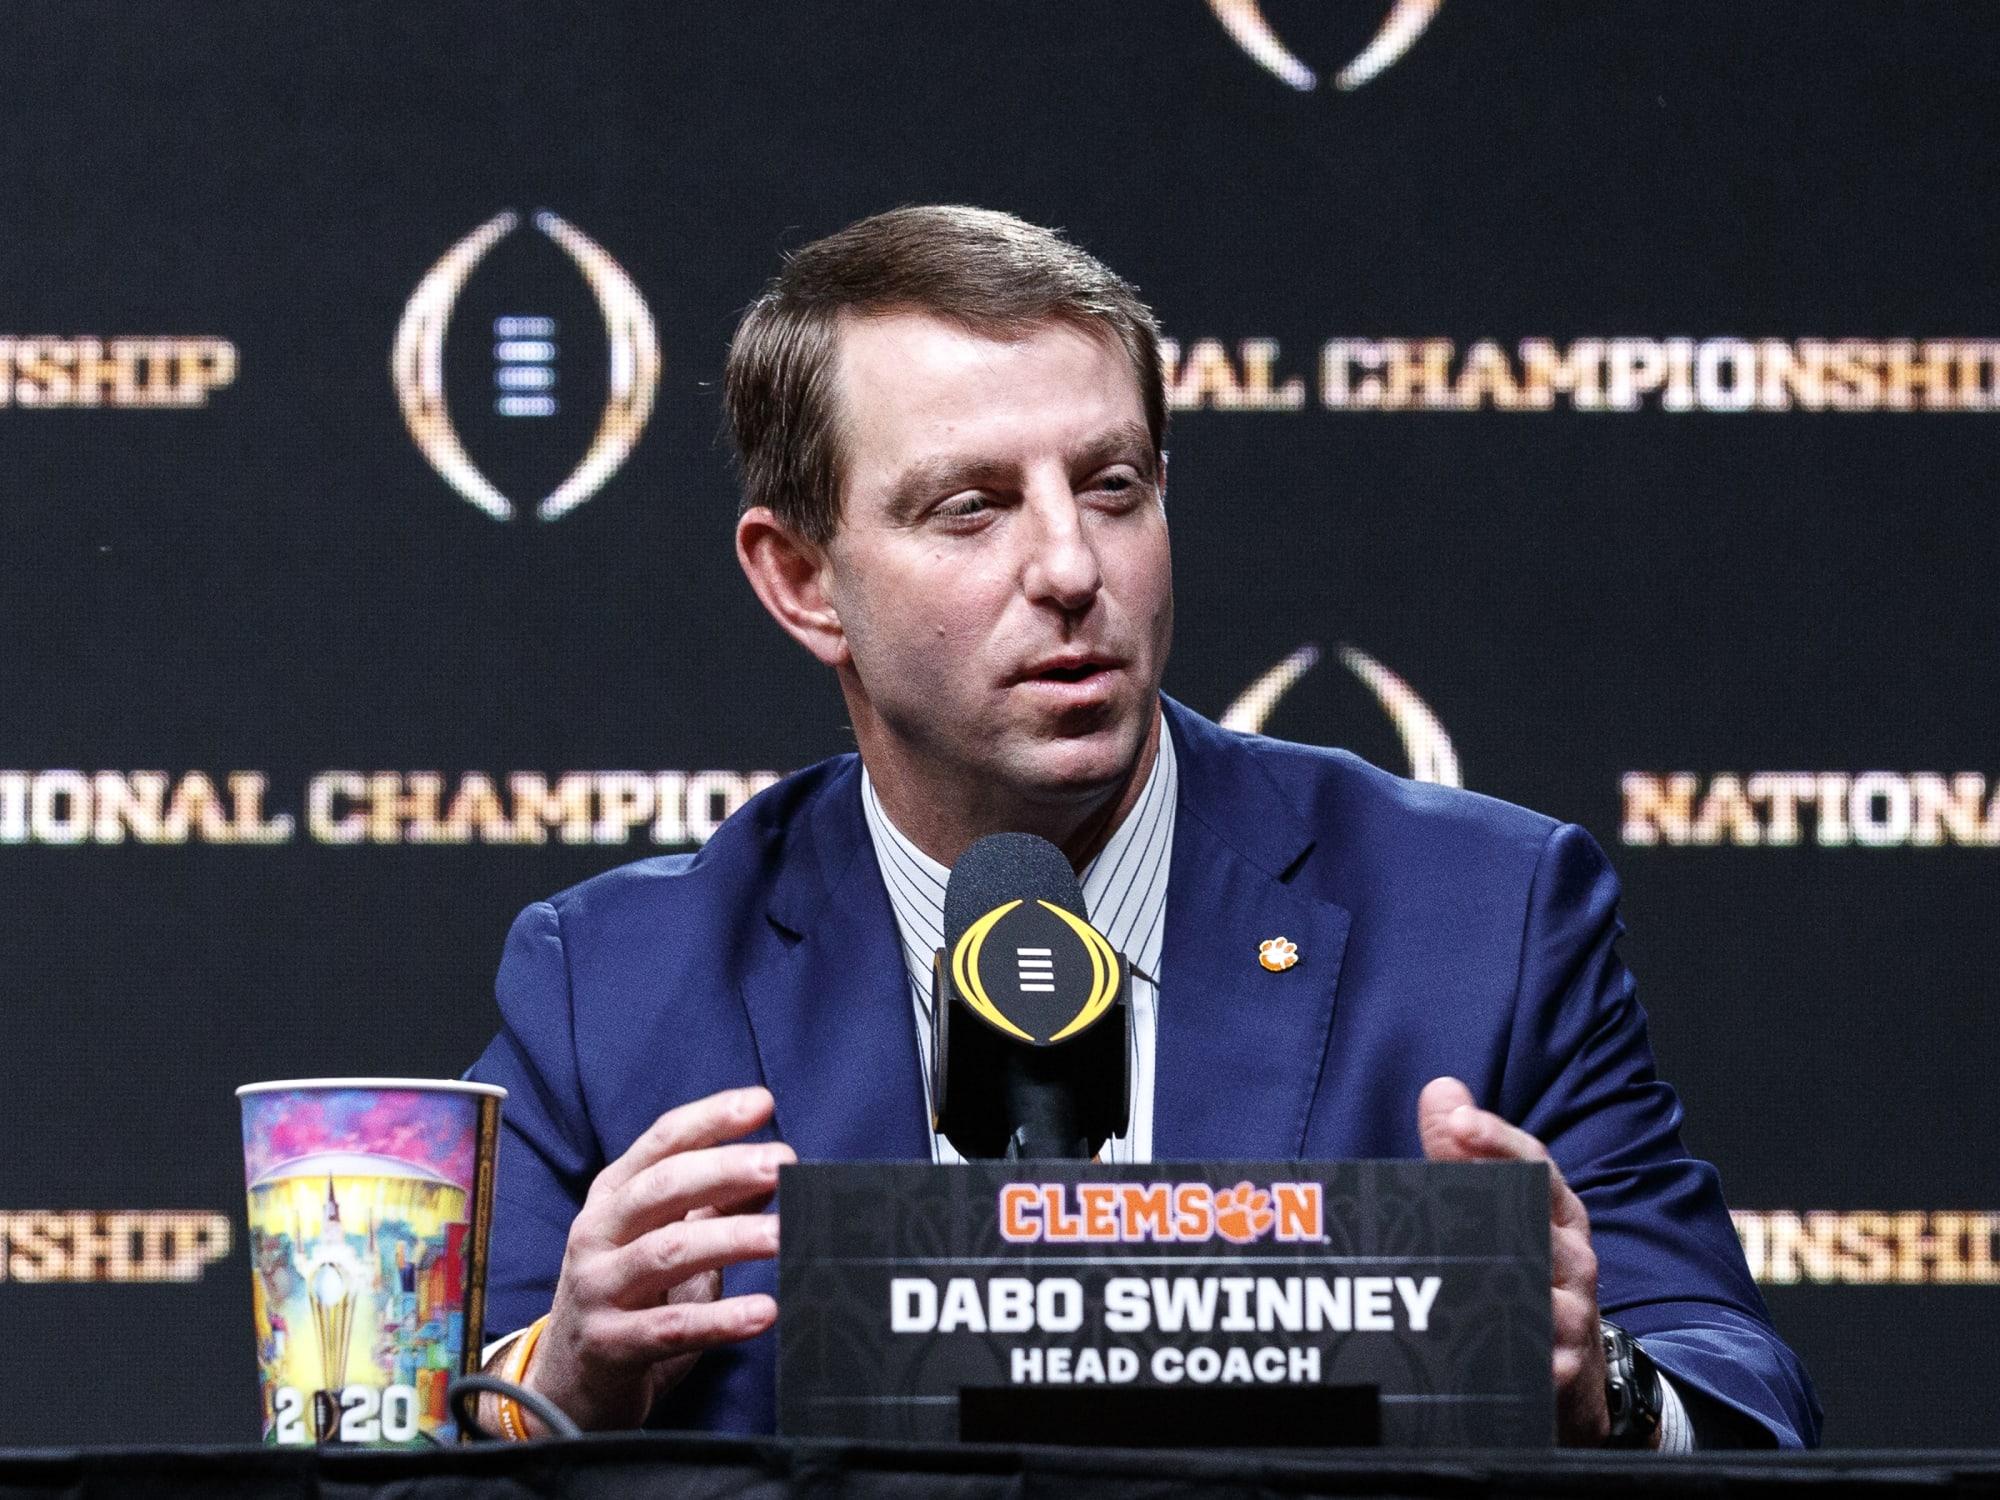 Clemson football: Colin Cowherd says ESPN hated Dabo Swinney's comments in 2017